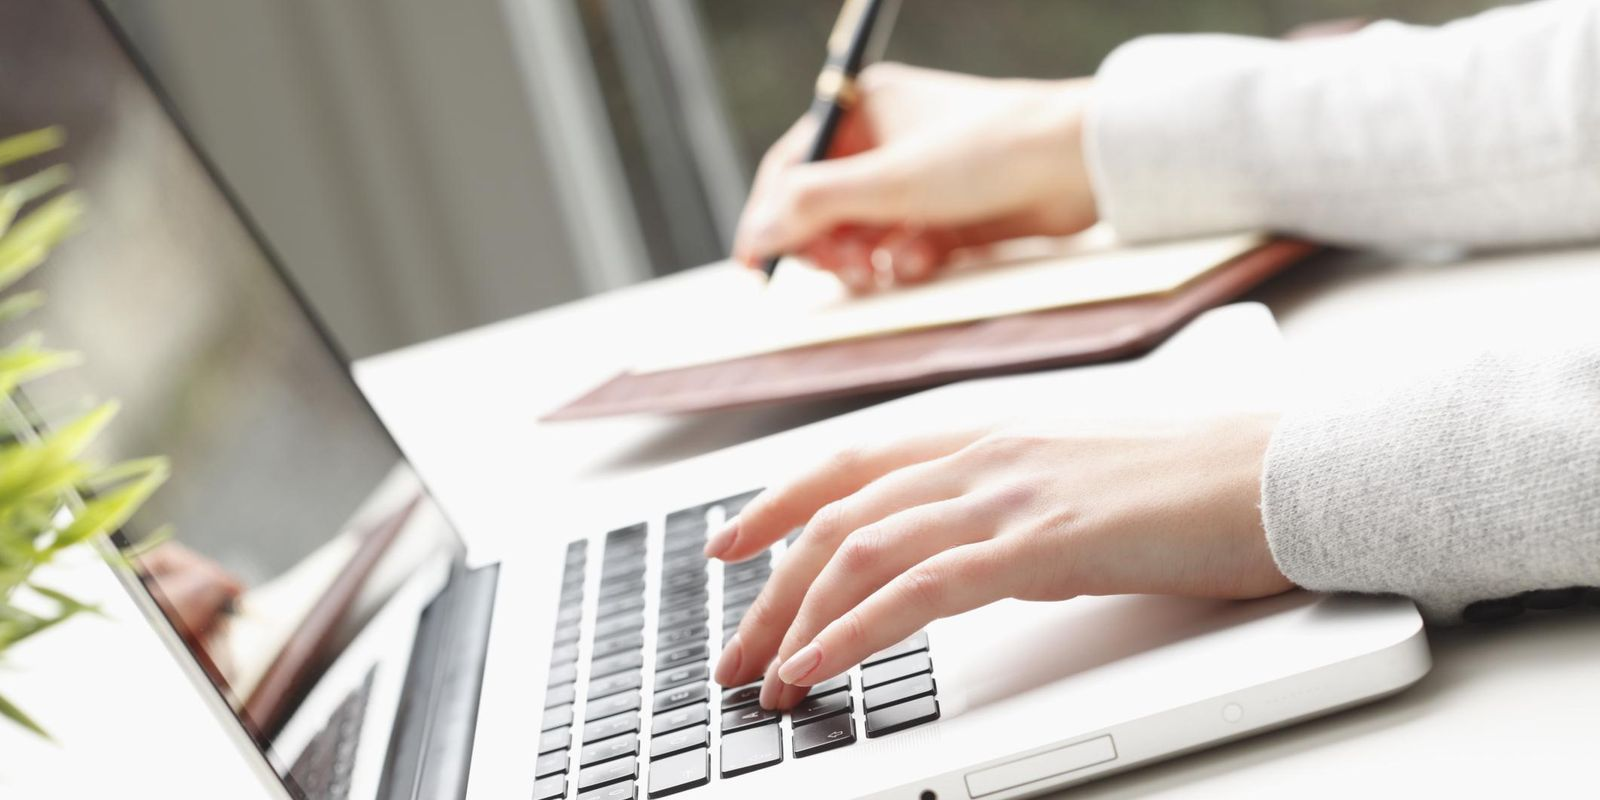 Dissertation help service in london